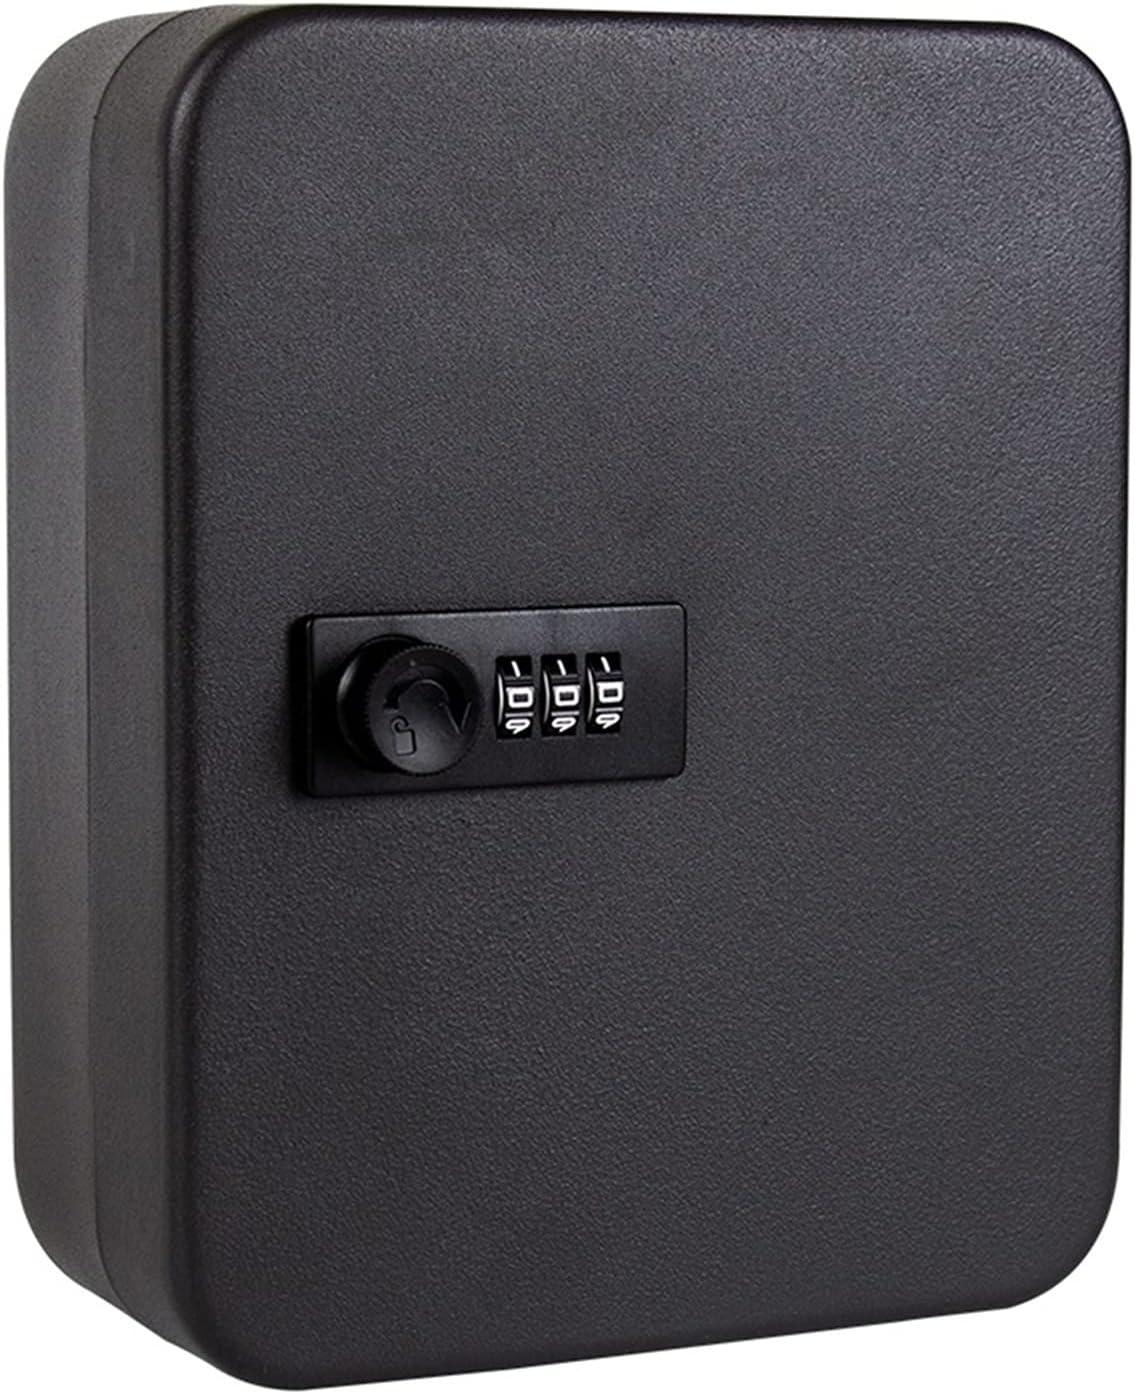 Al sold out. LICGHONG Key Cabinets Max 70% OFF 32 Keys Lock Wall Boxes Mounte Box